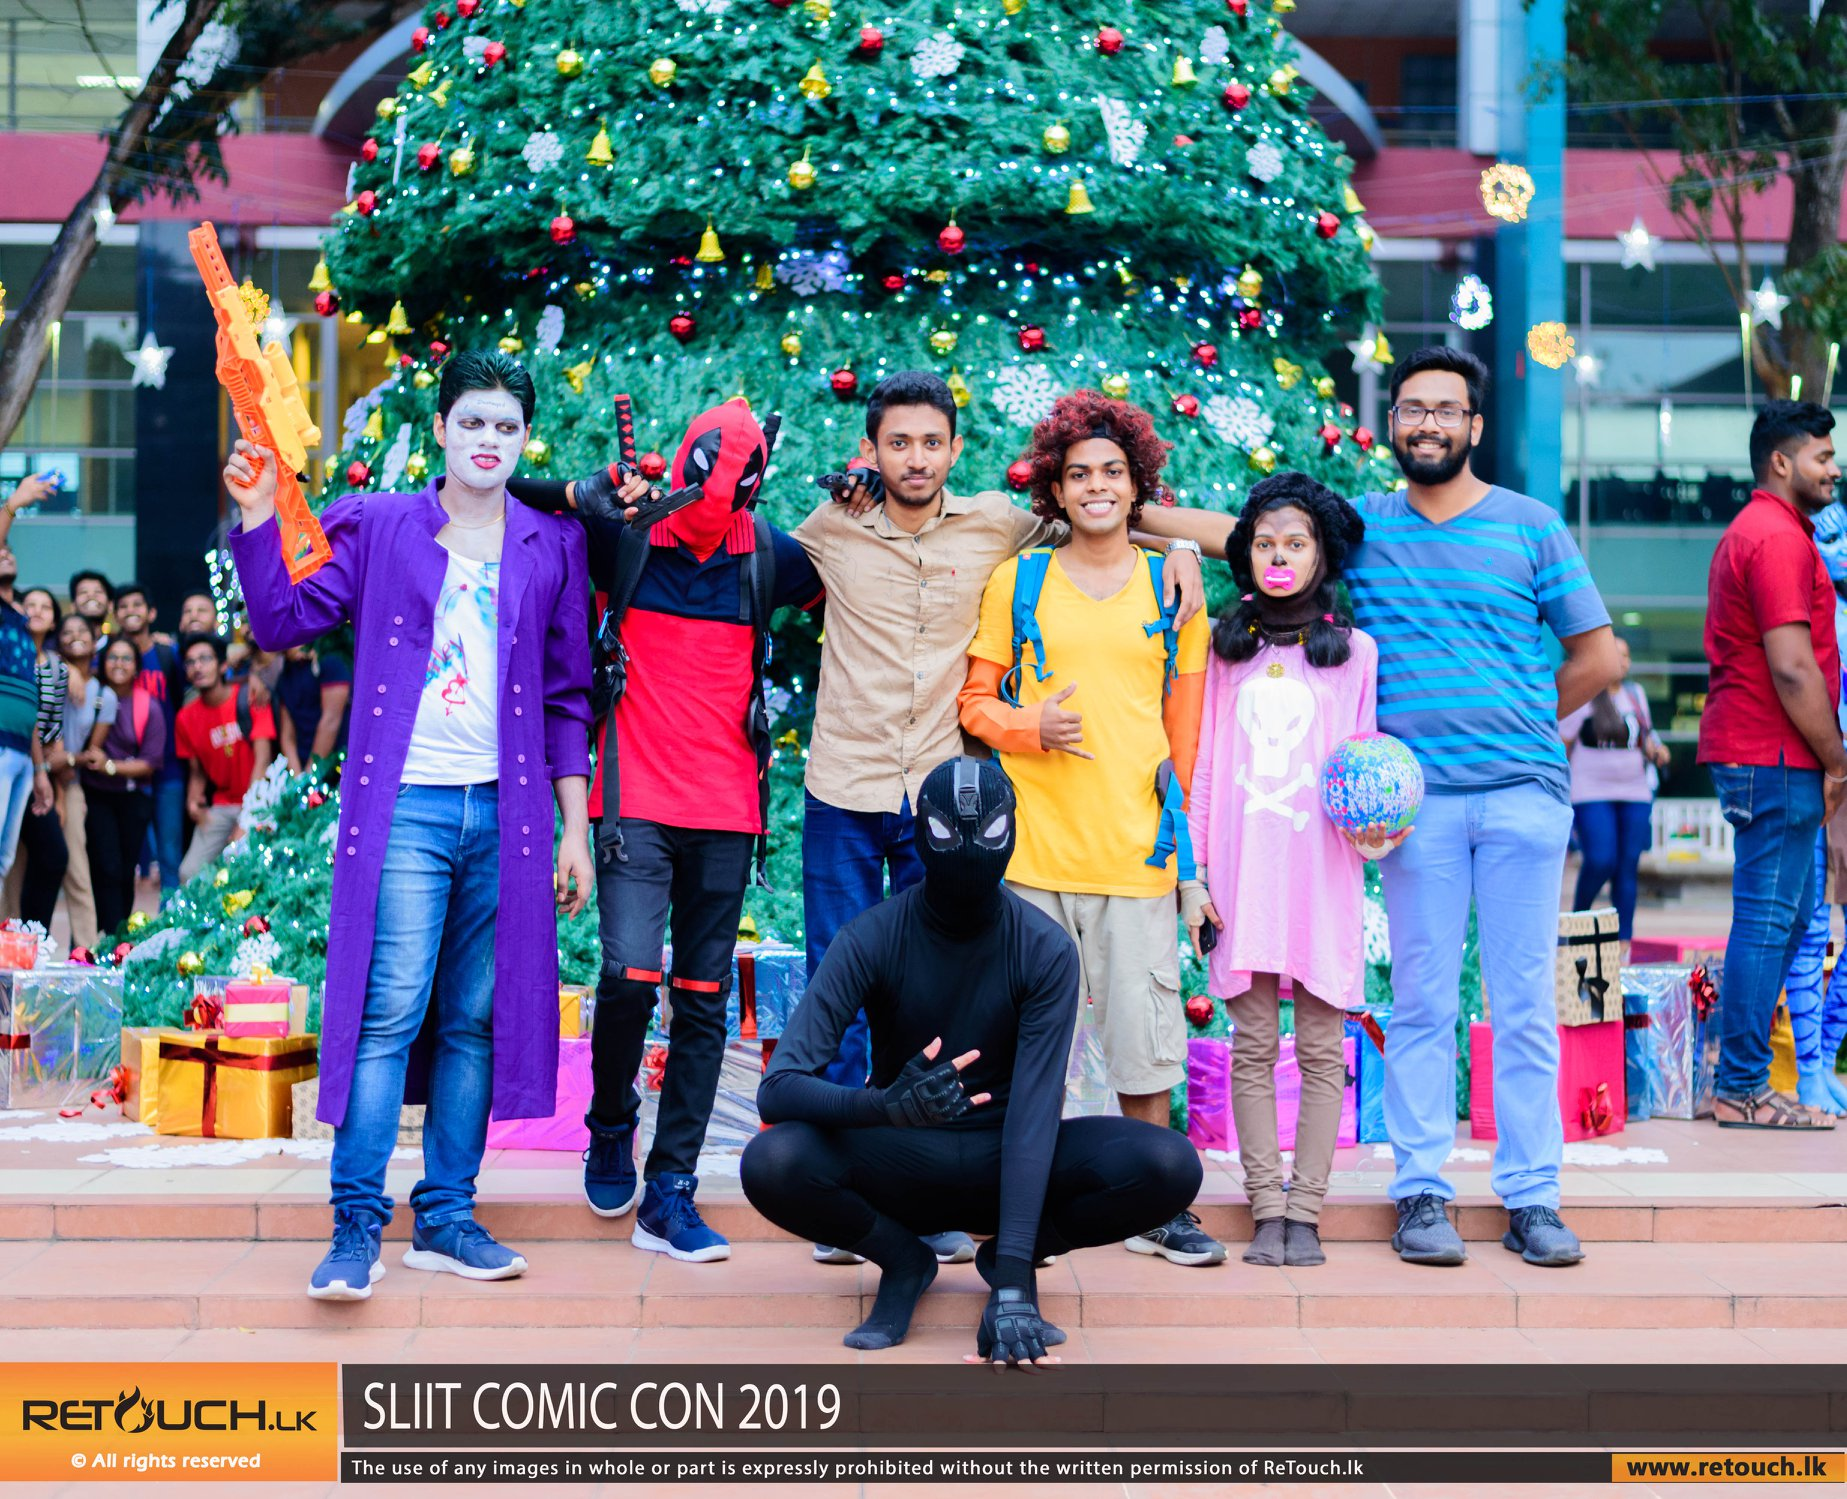 comic-con-2019-december-1